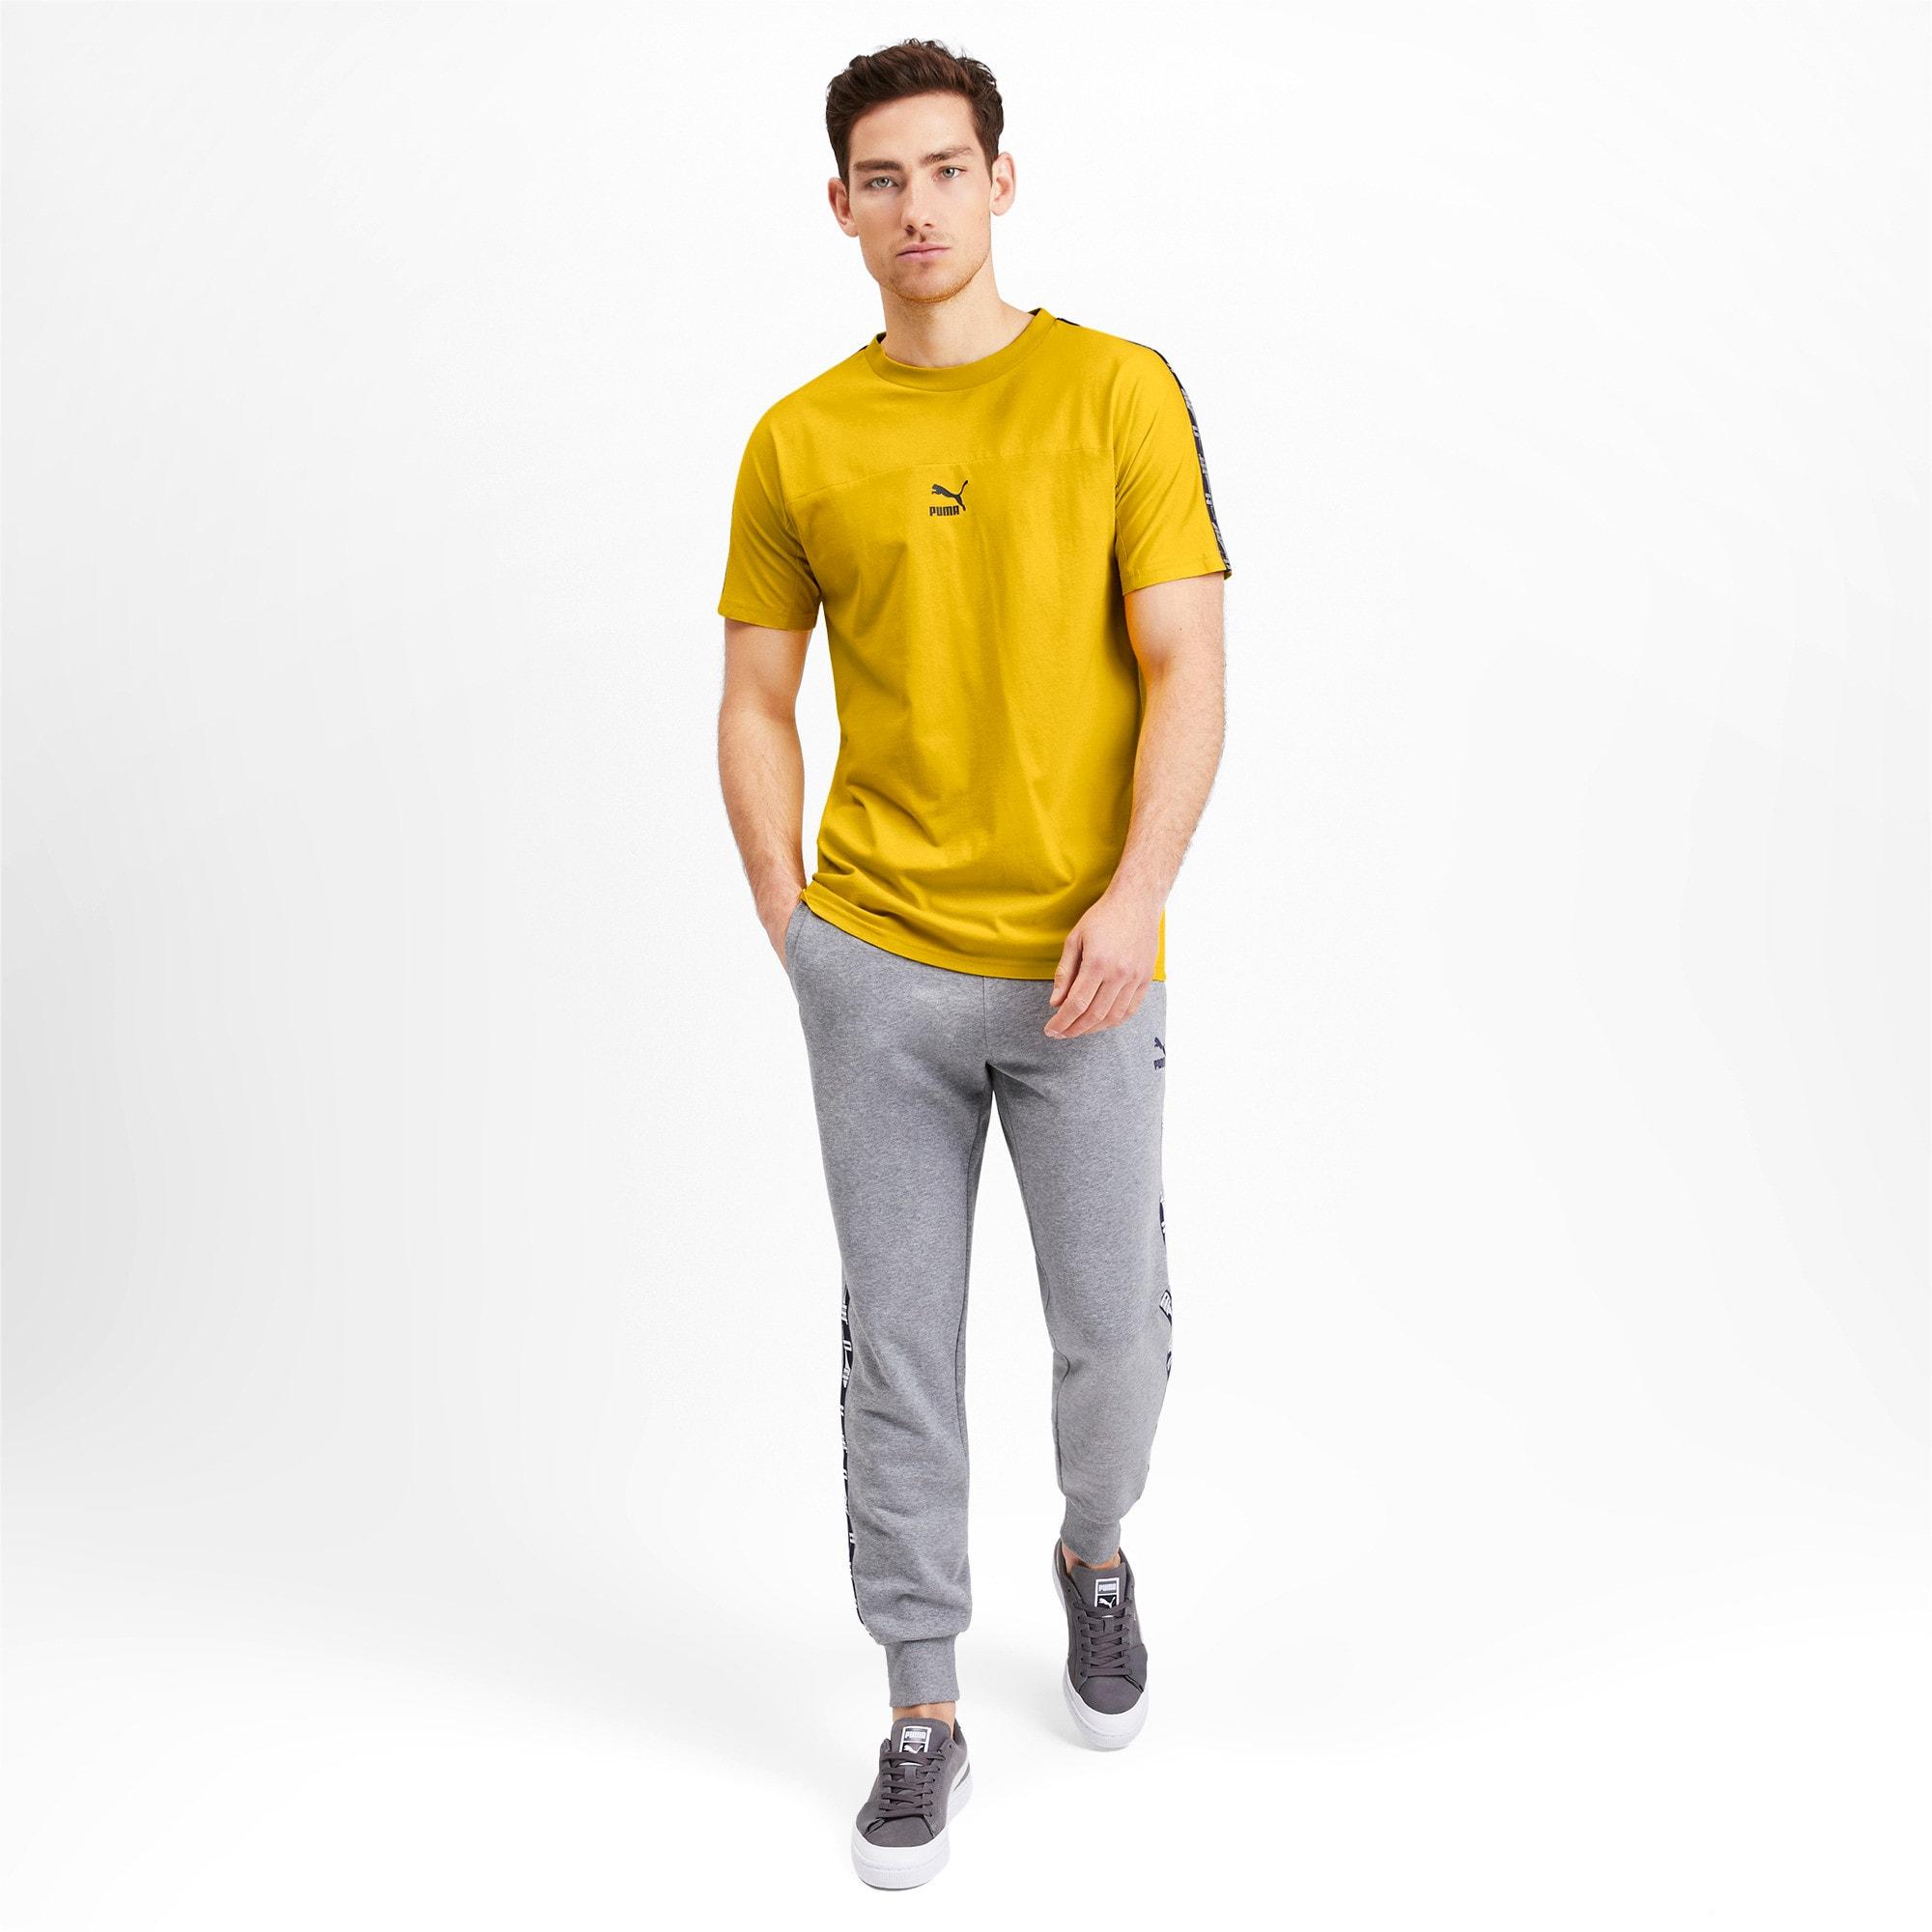 Thumbnail 4 of PUMA XTG SS Tシャツ, Sulphur, medium-JPN